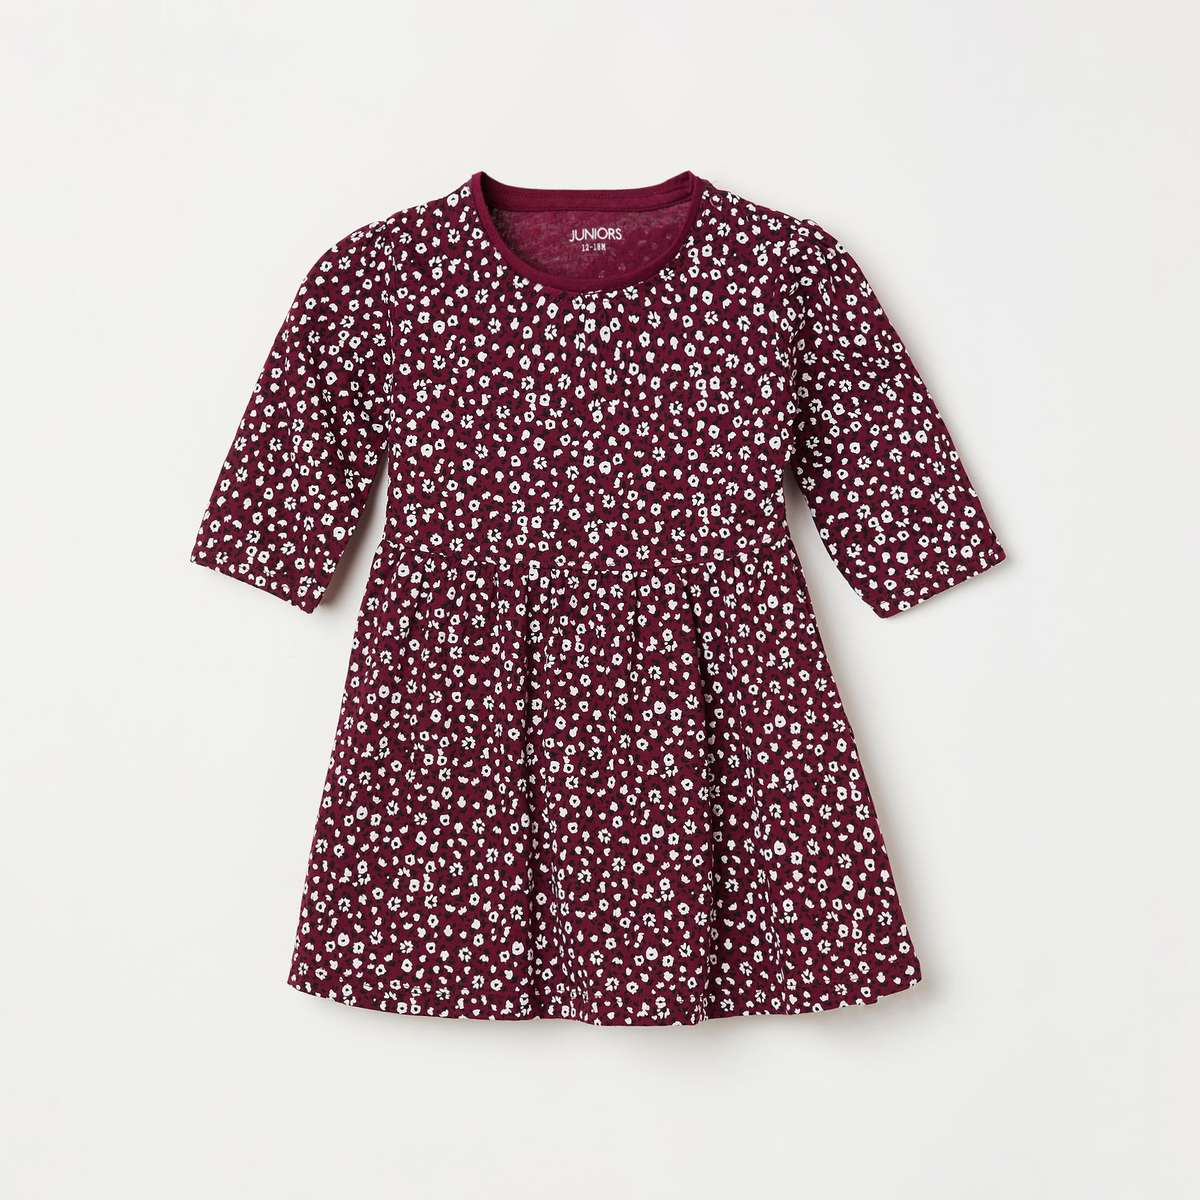 2.JUNIORS Girls Printed Fit & Flare Dress